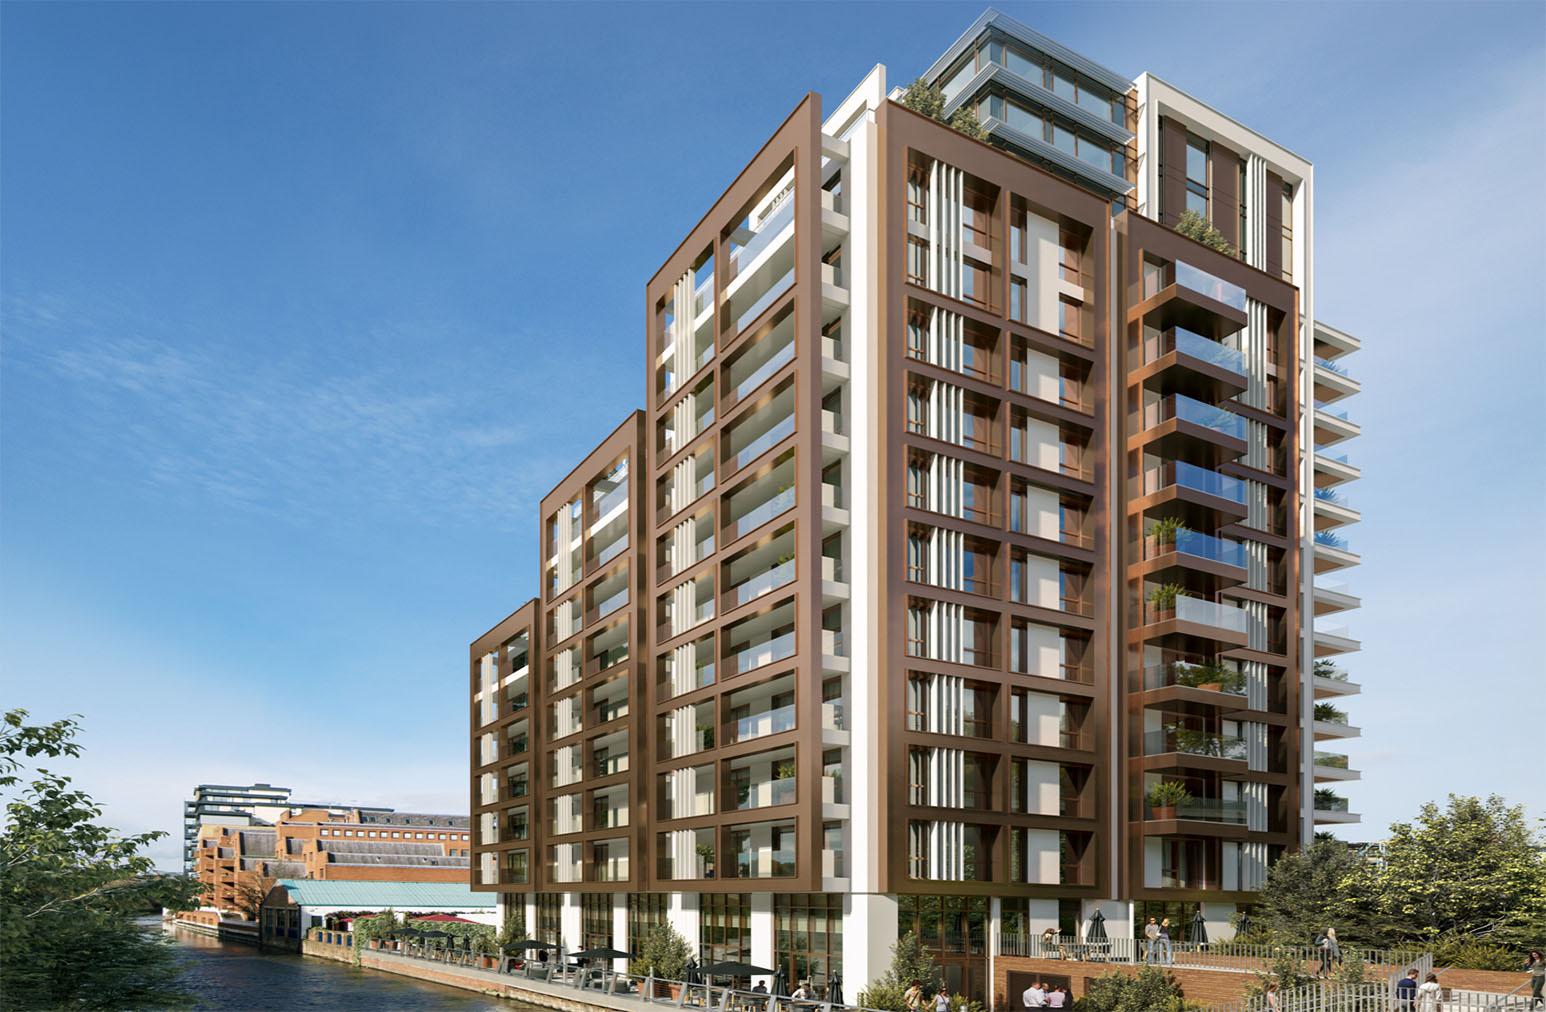 Henry construction - developers - apartment building